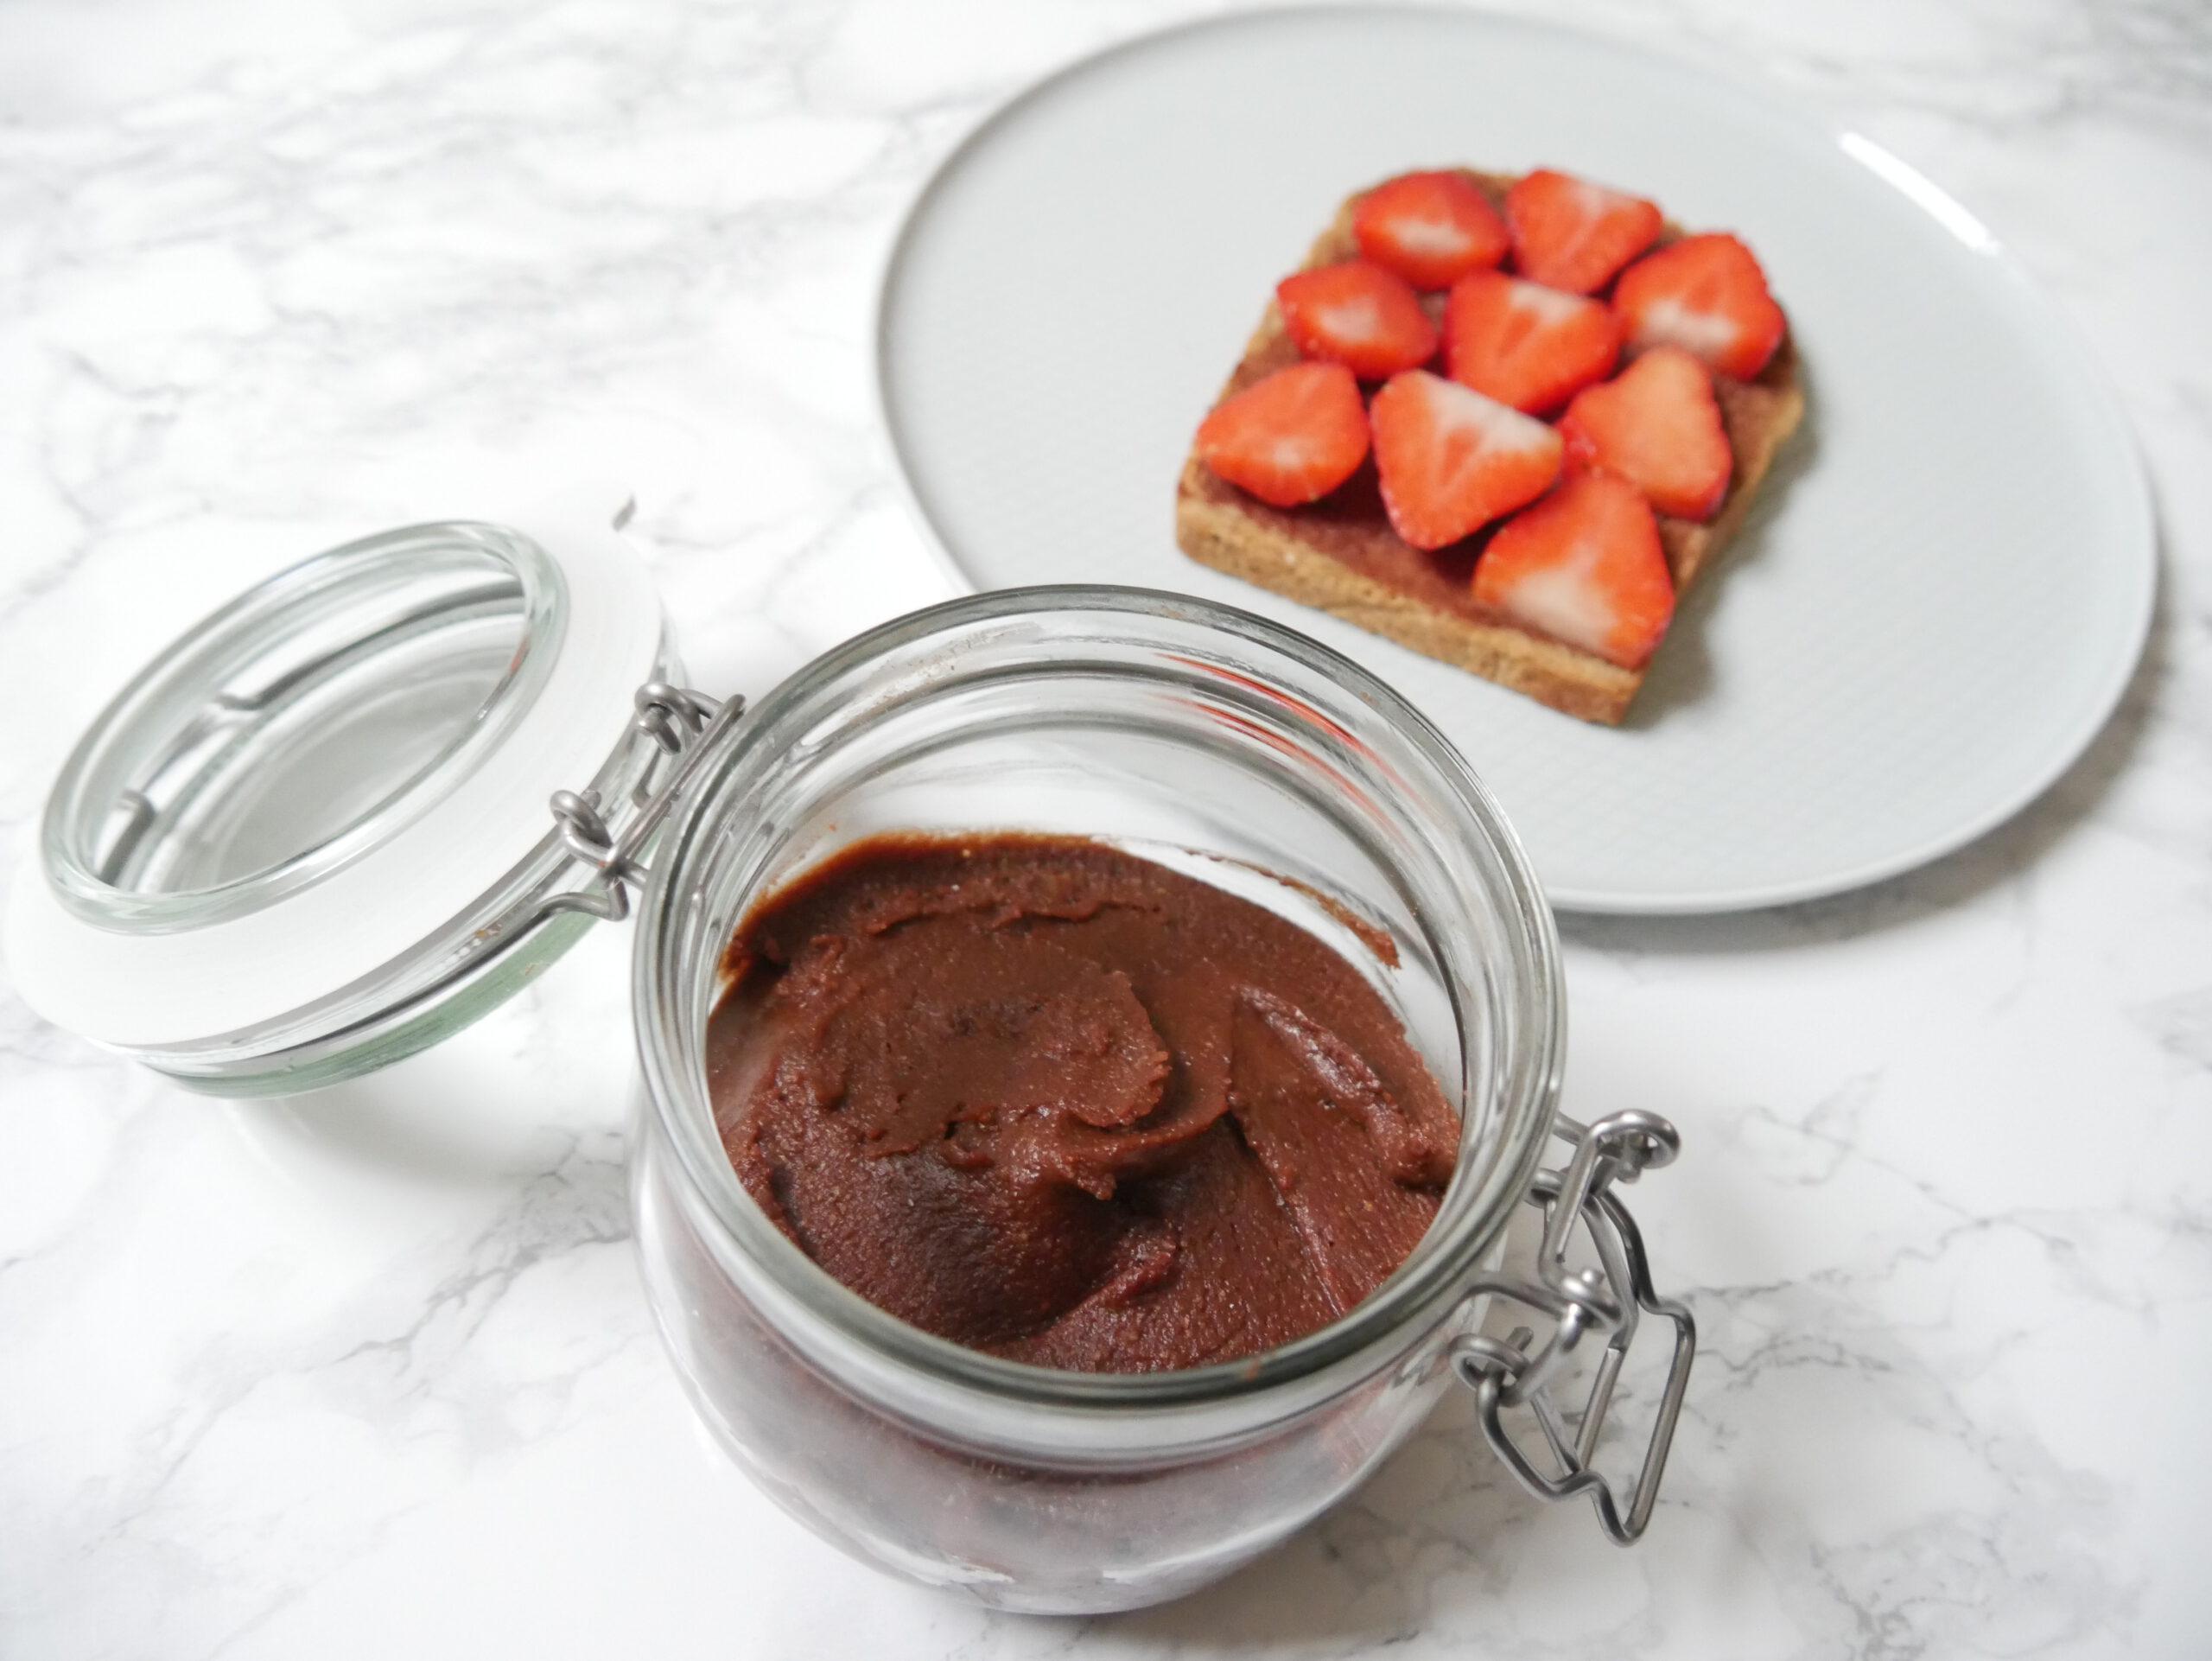 Gezonde vegan Nutella (recept)